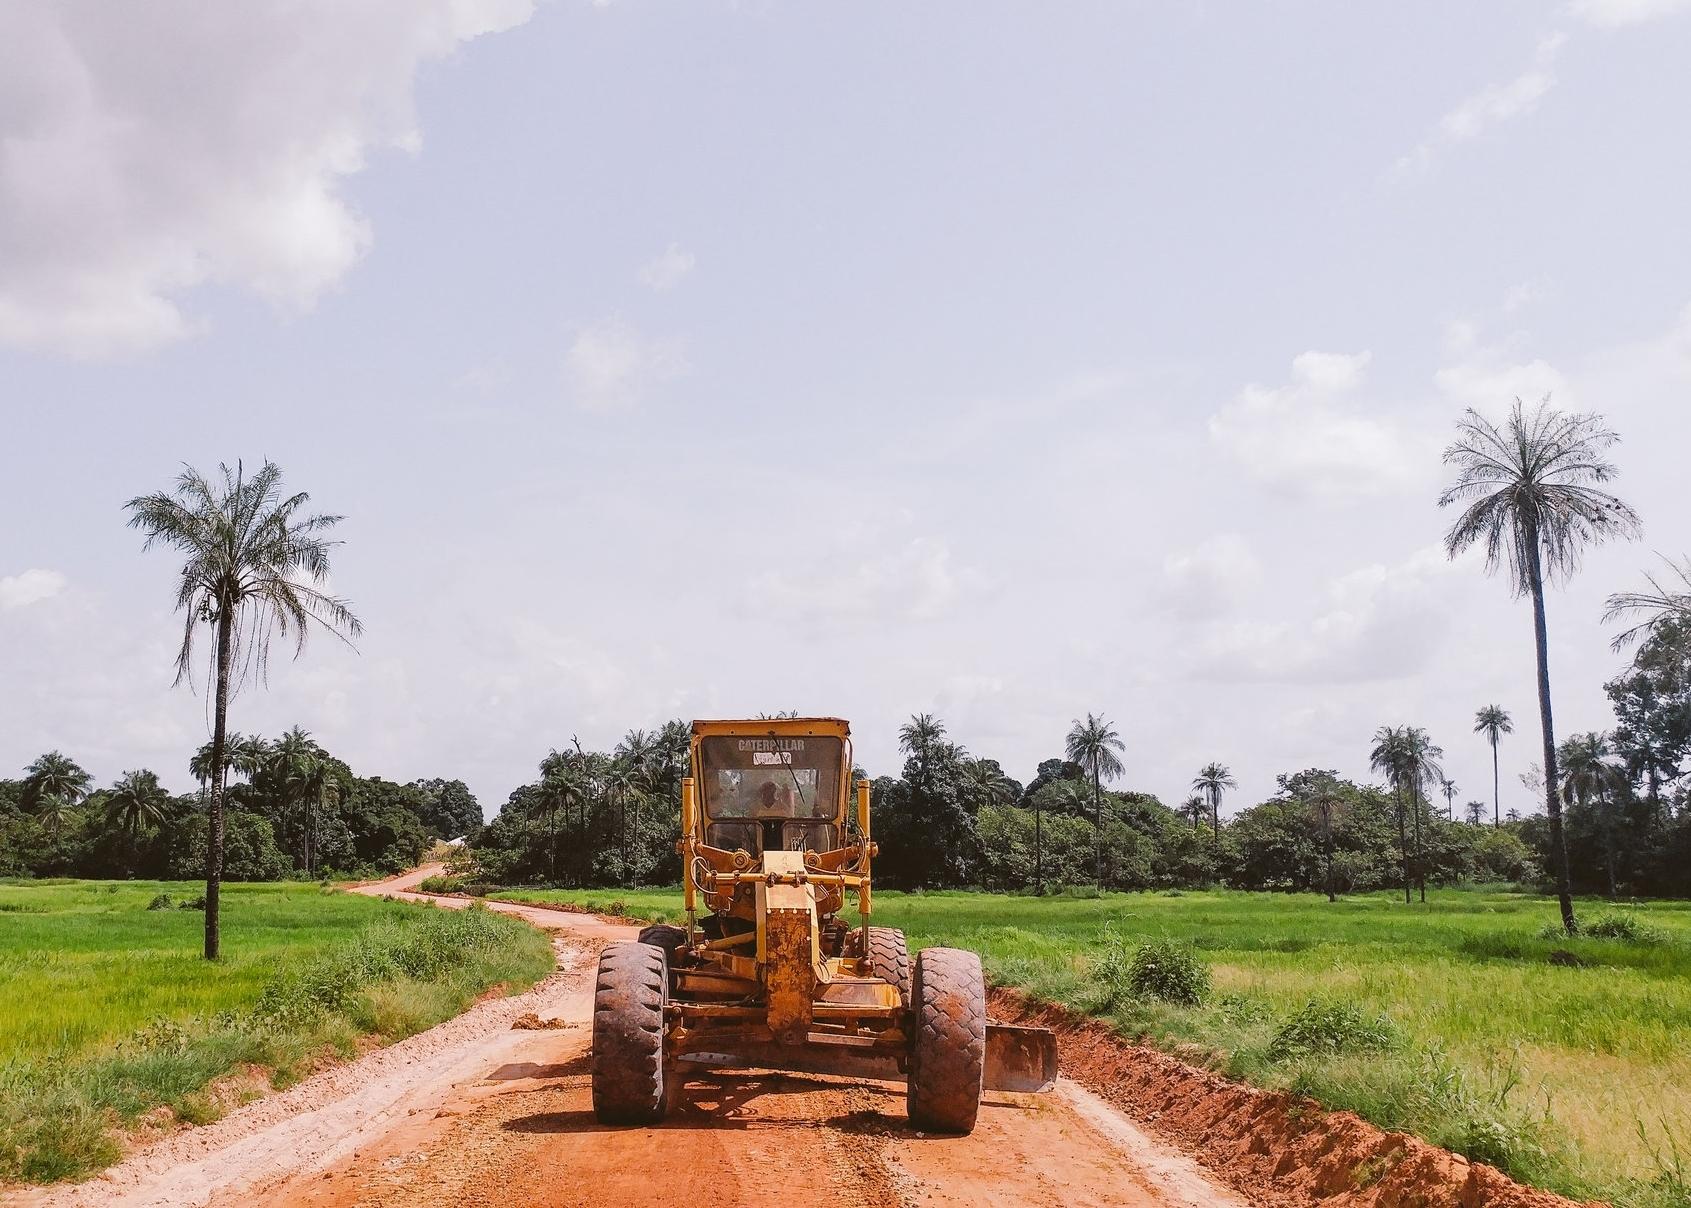 Preparing the roadbeds using heavy machinery